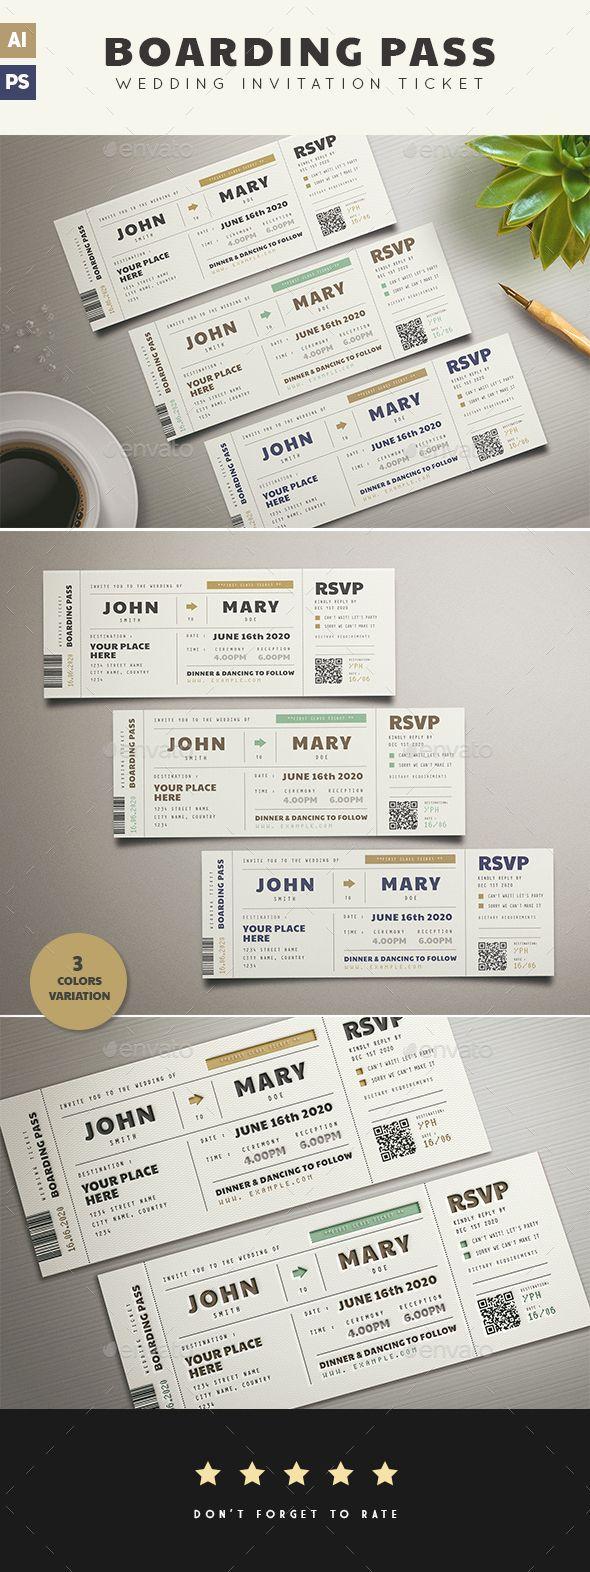 Boarding Pass Wedding Invitation Wedding Invitation Card